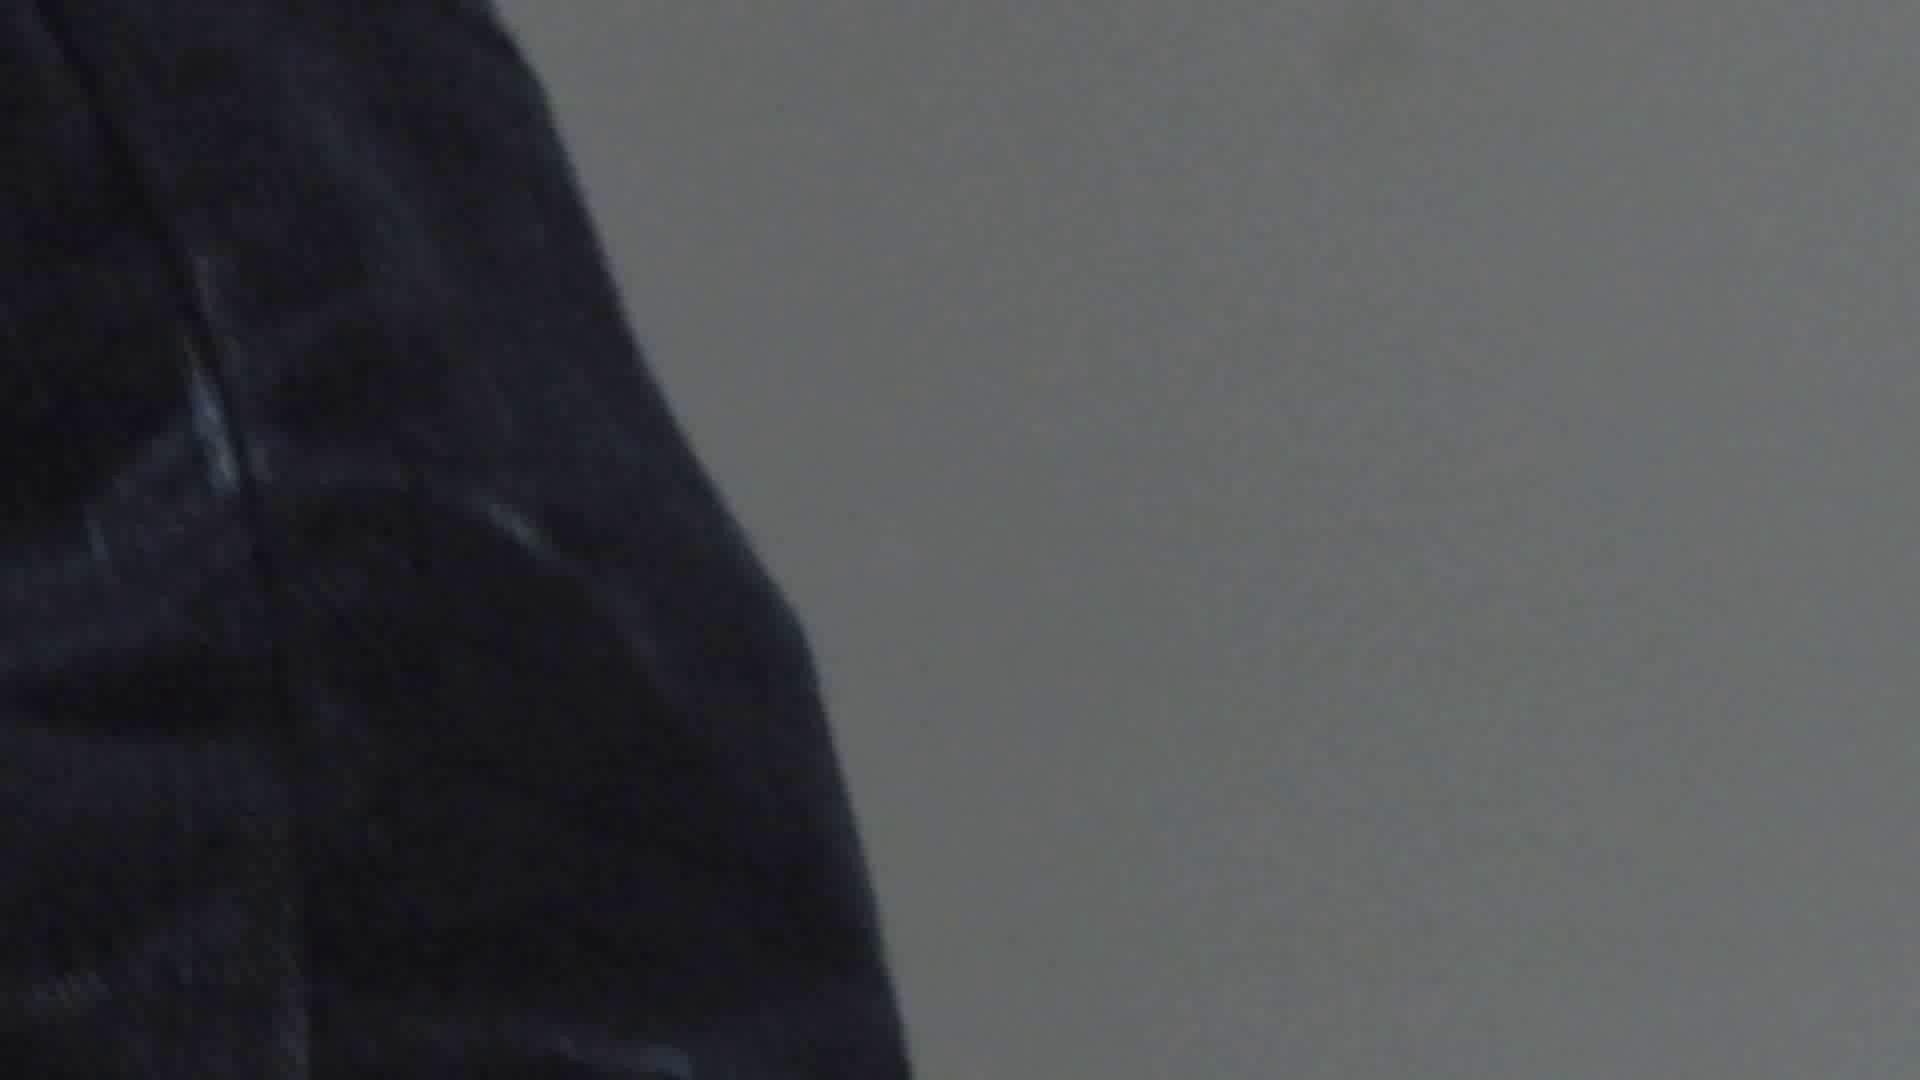 vol.25三十時間潜り、一つしか出会えない完璧桃尻編 byお銀 美人の裸体 おまんこ動画流出 106枚 26